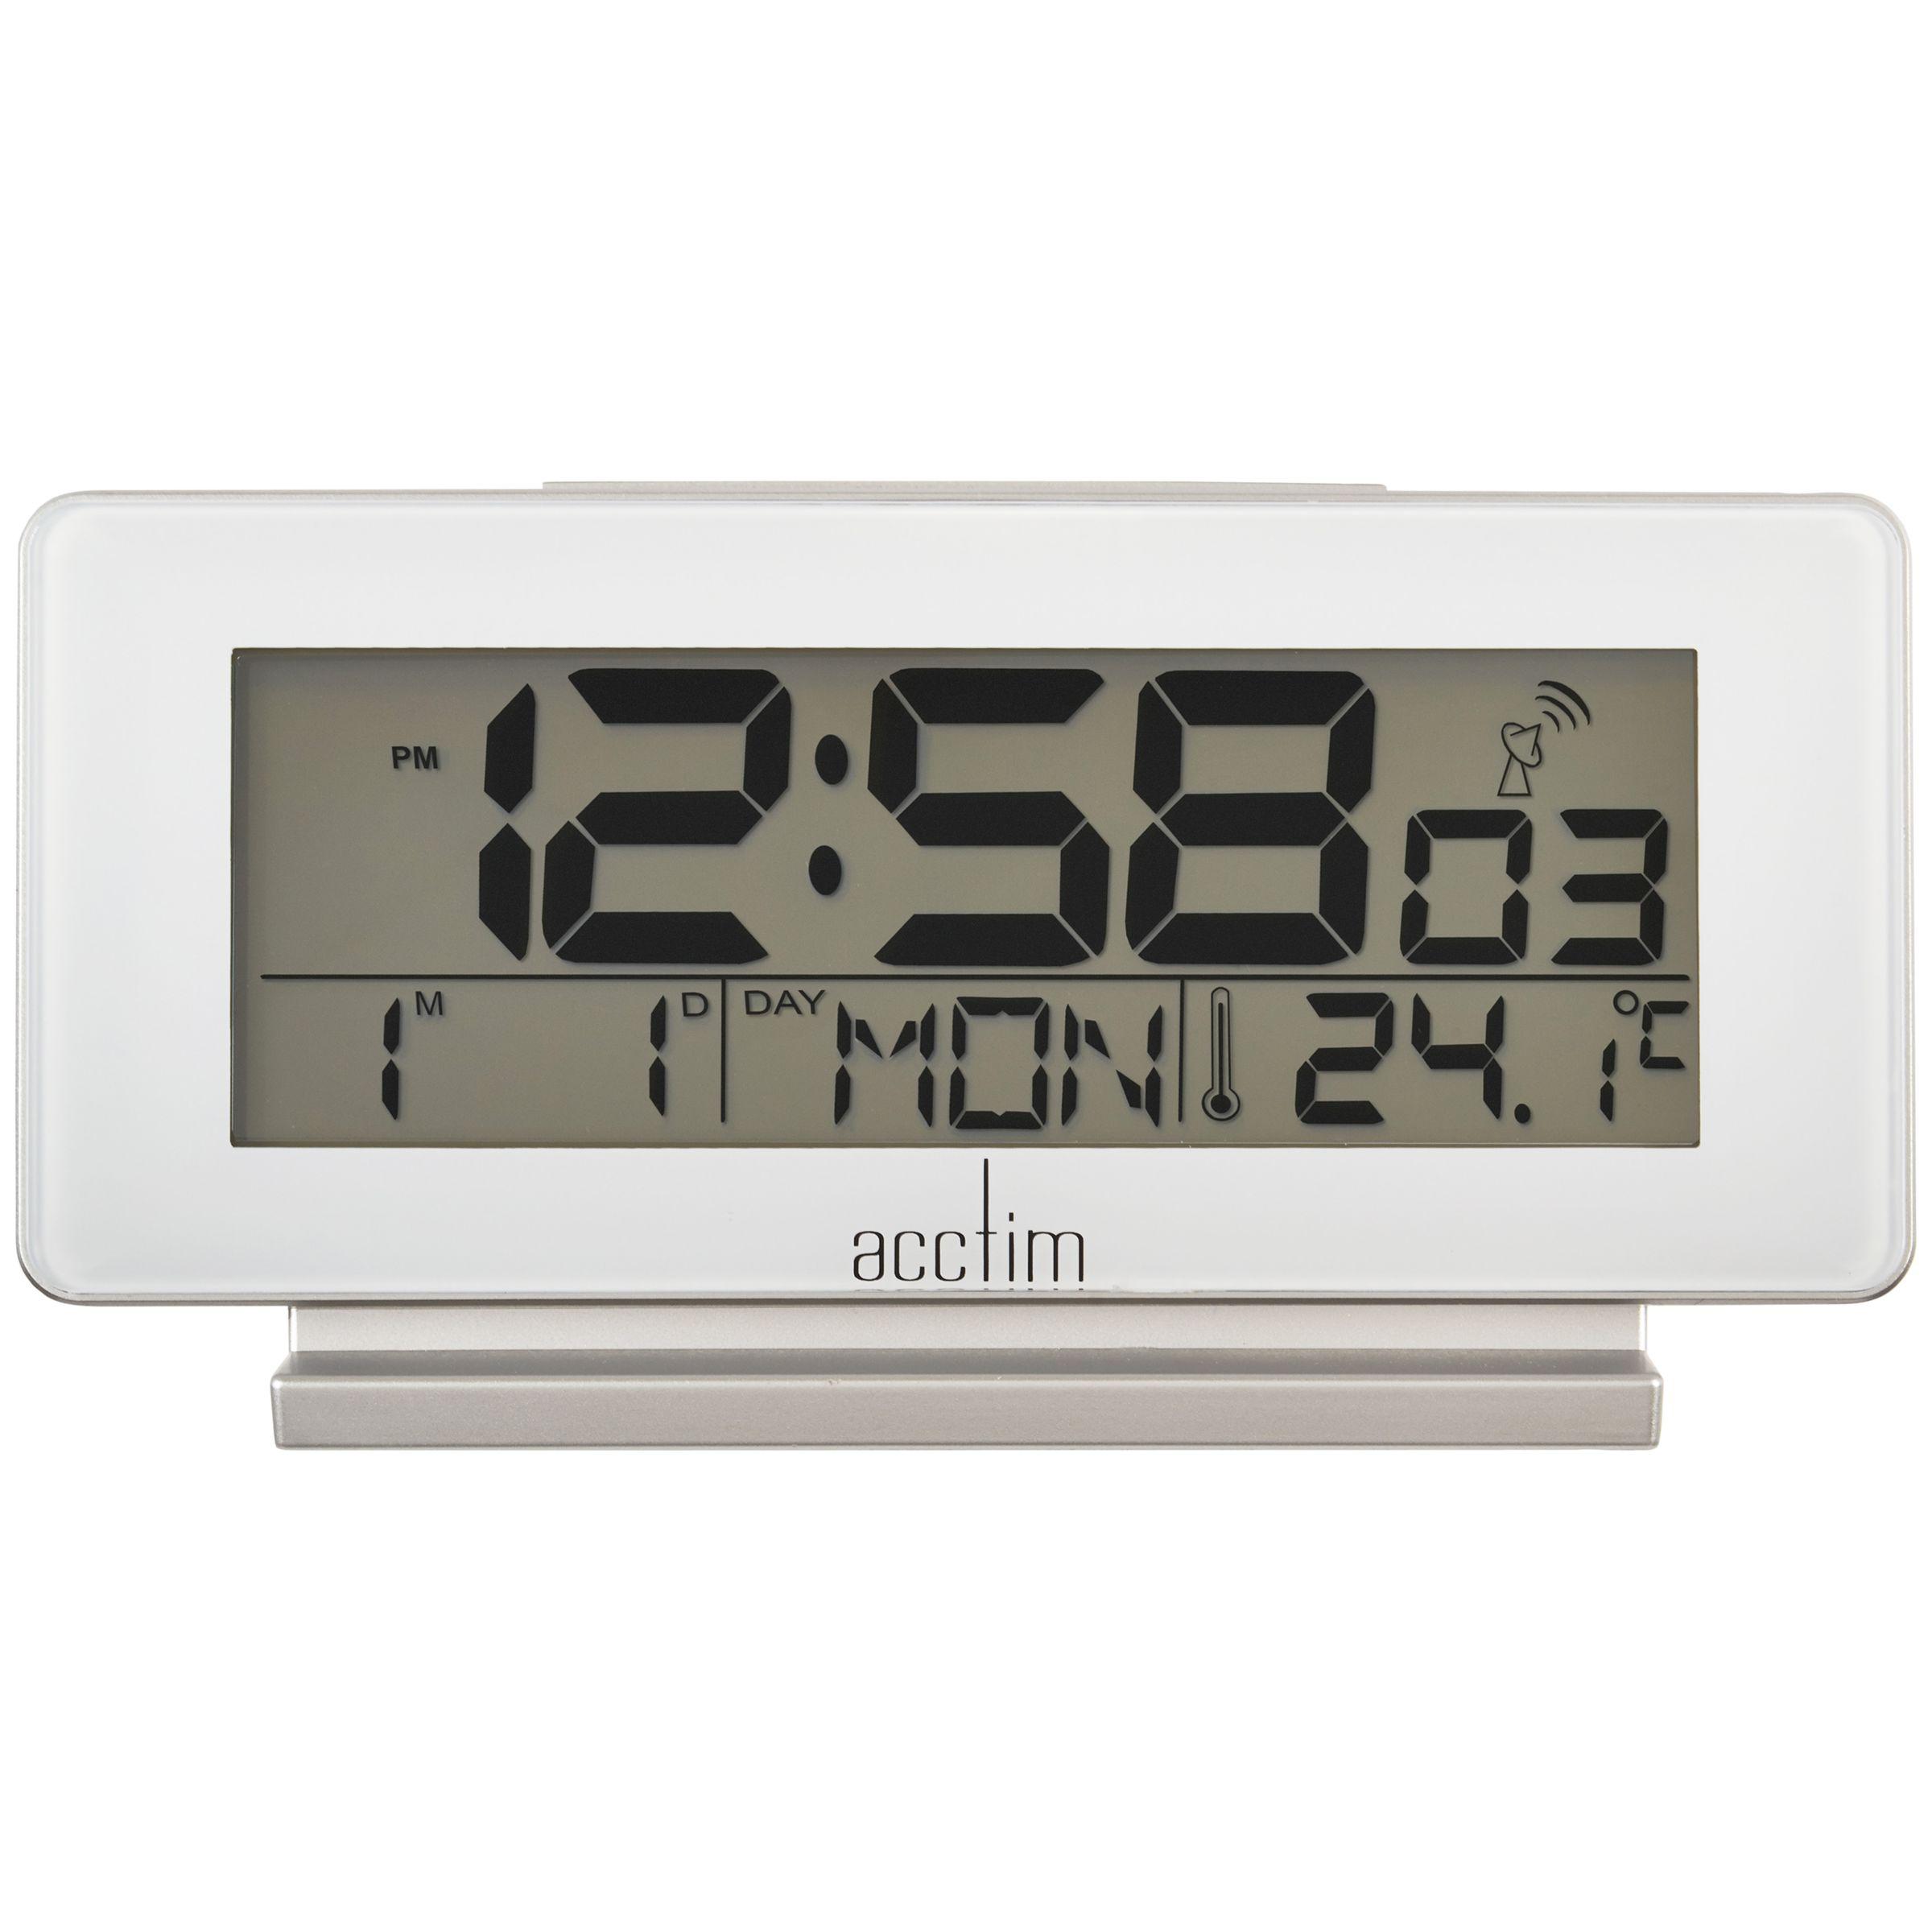 Acctim Acctim Novara Radio Controlled Alarm Clock, White